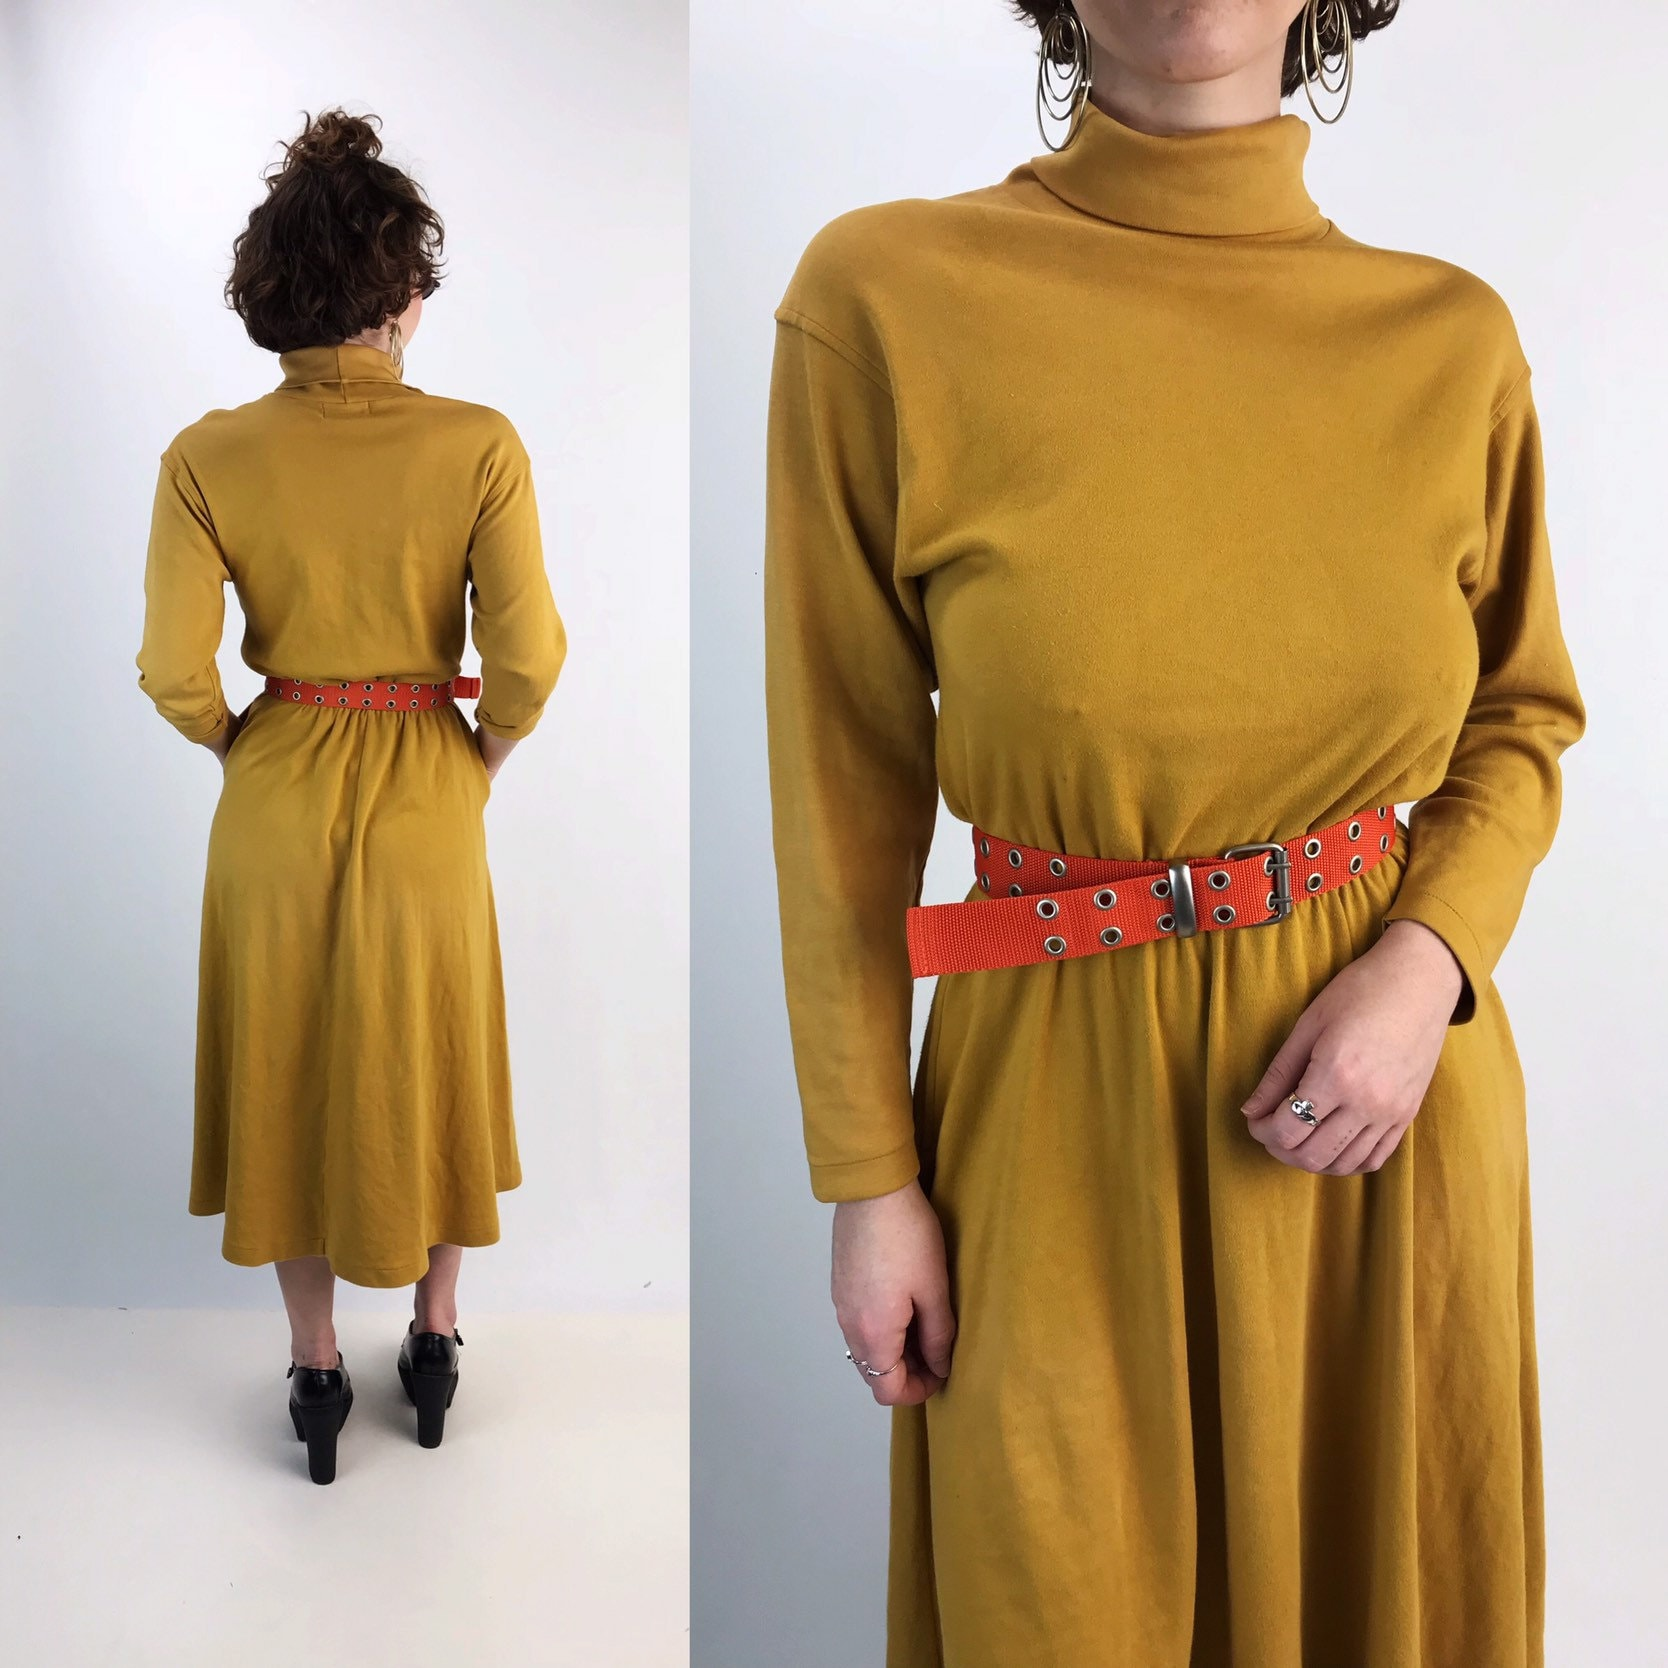 0bdf15013d49 80 s Long Sleeve Turtleneck A-line Cotton Midi Dress w  Pockets S M ...